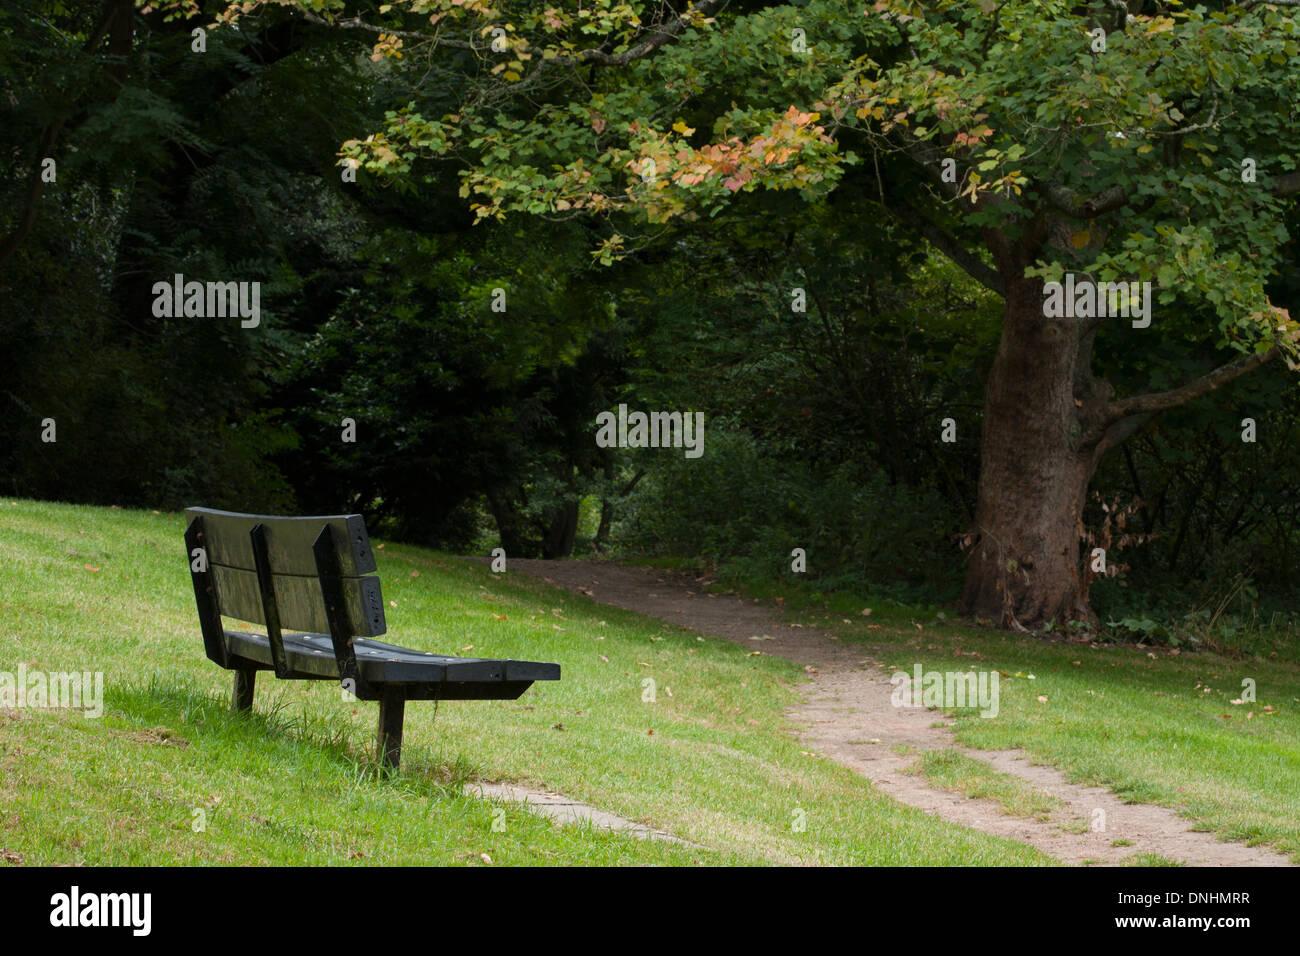 An imitation wood park bench near a gravel path in Hampstead Heath. - Stock Image